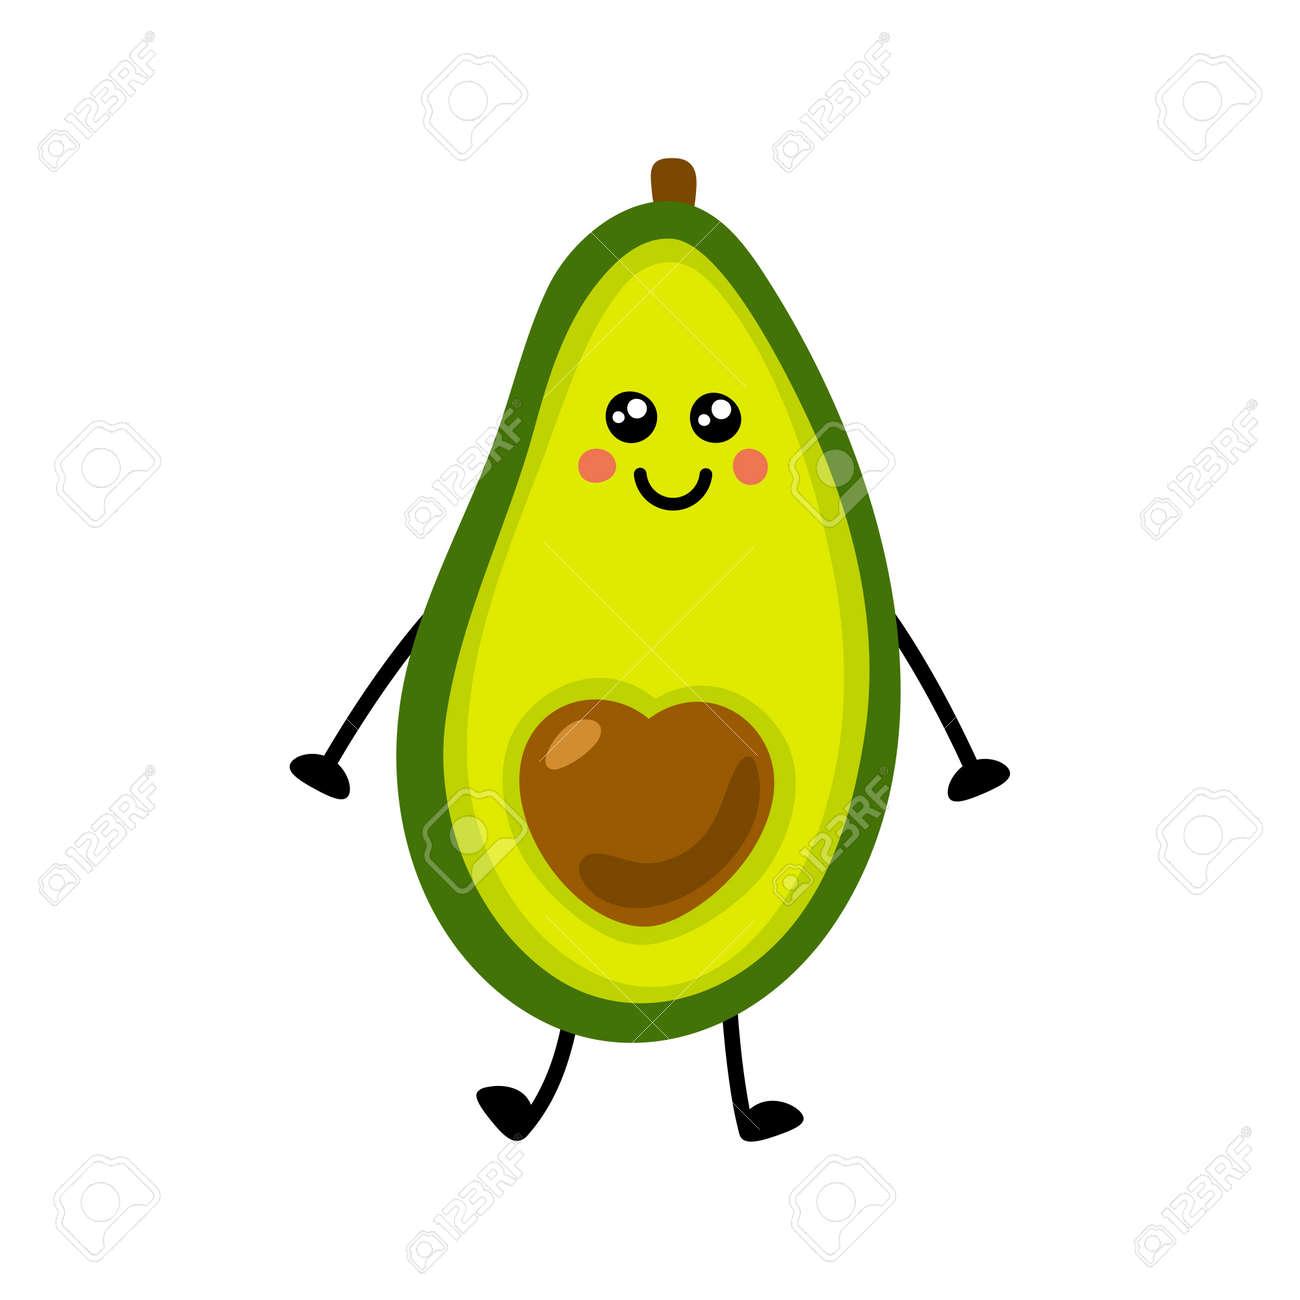 Avocado icon. Flat illustration of avocado vector icon isolated on white background. - 169772077